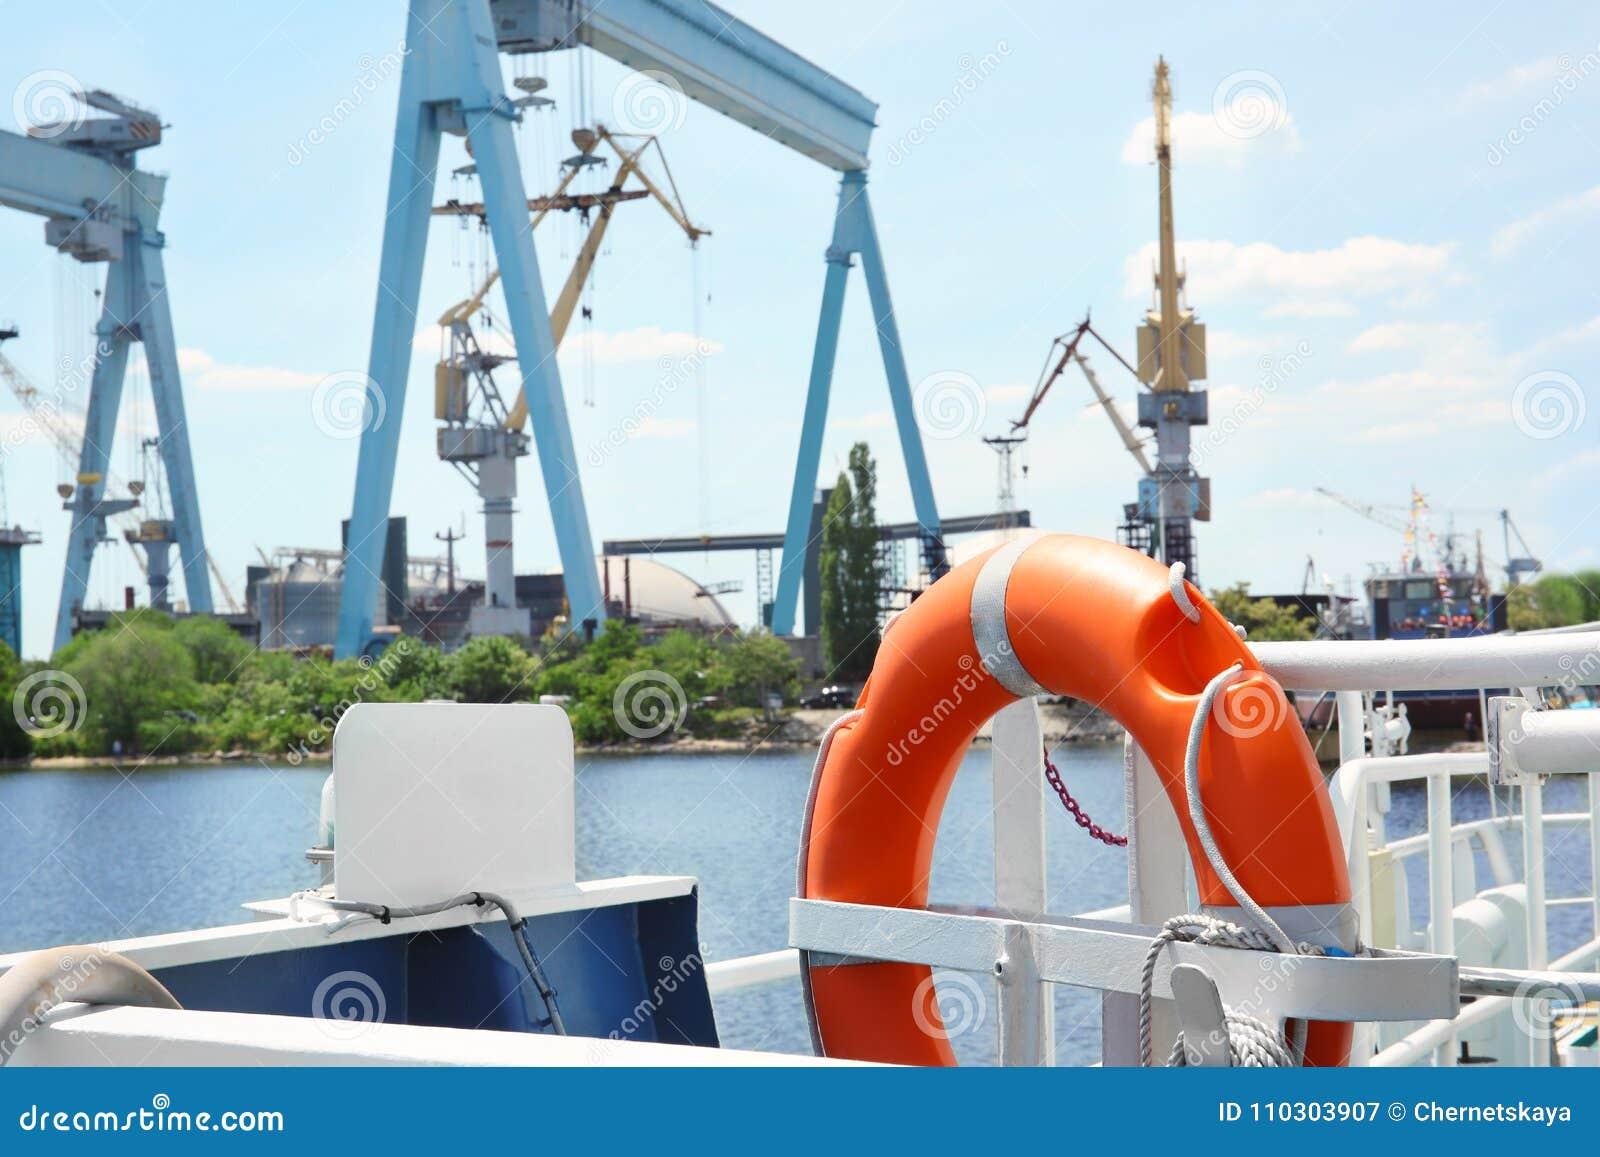 Flotation ring onboard the vessel